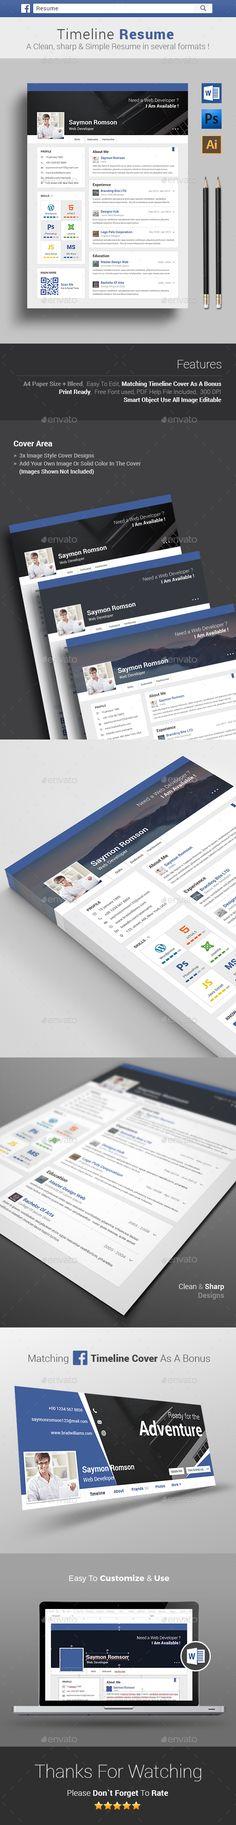 Timeline Resume Template PSD, Vector AI #design Download: http://graphicriver.net/item/-timeline-resume/14277955?ref=ksioks